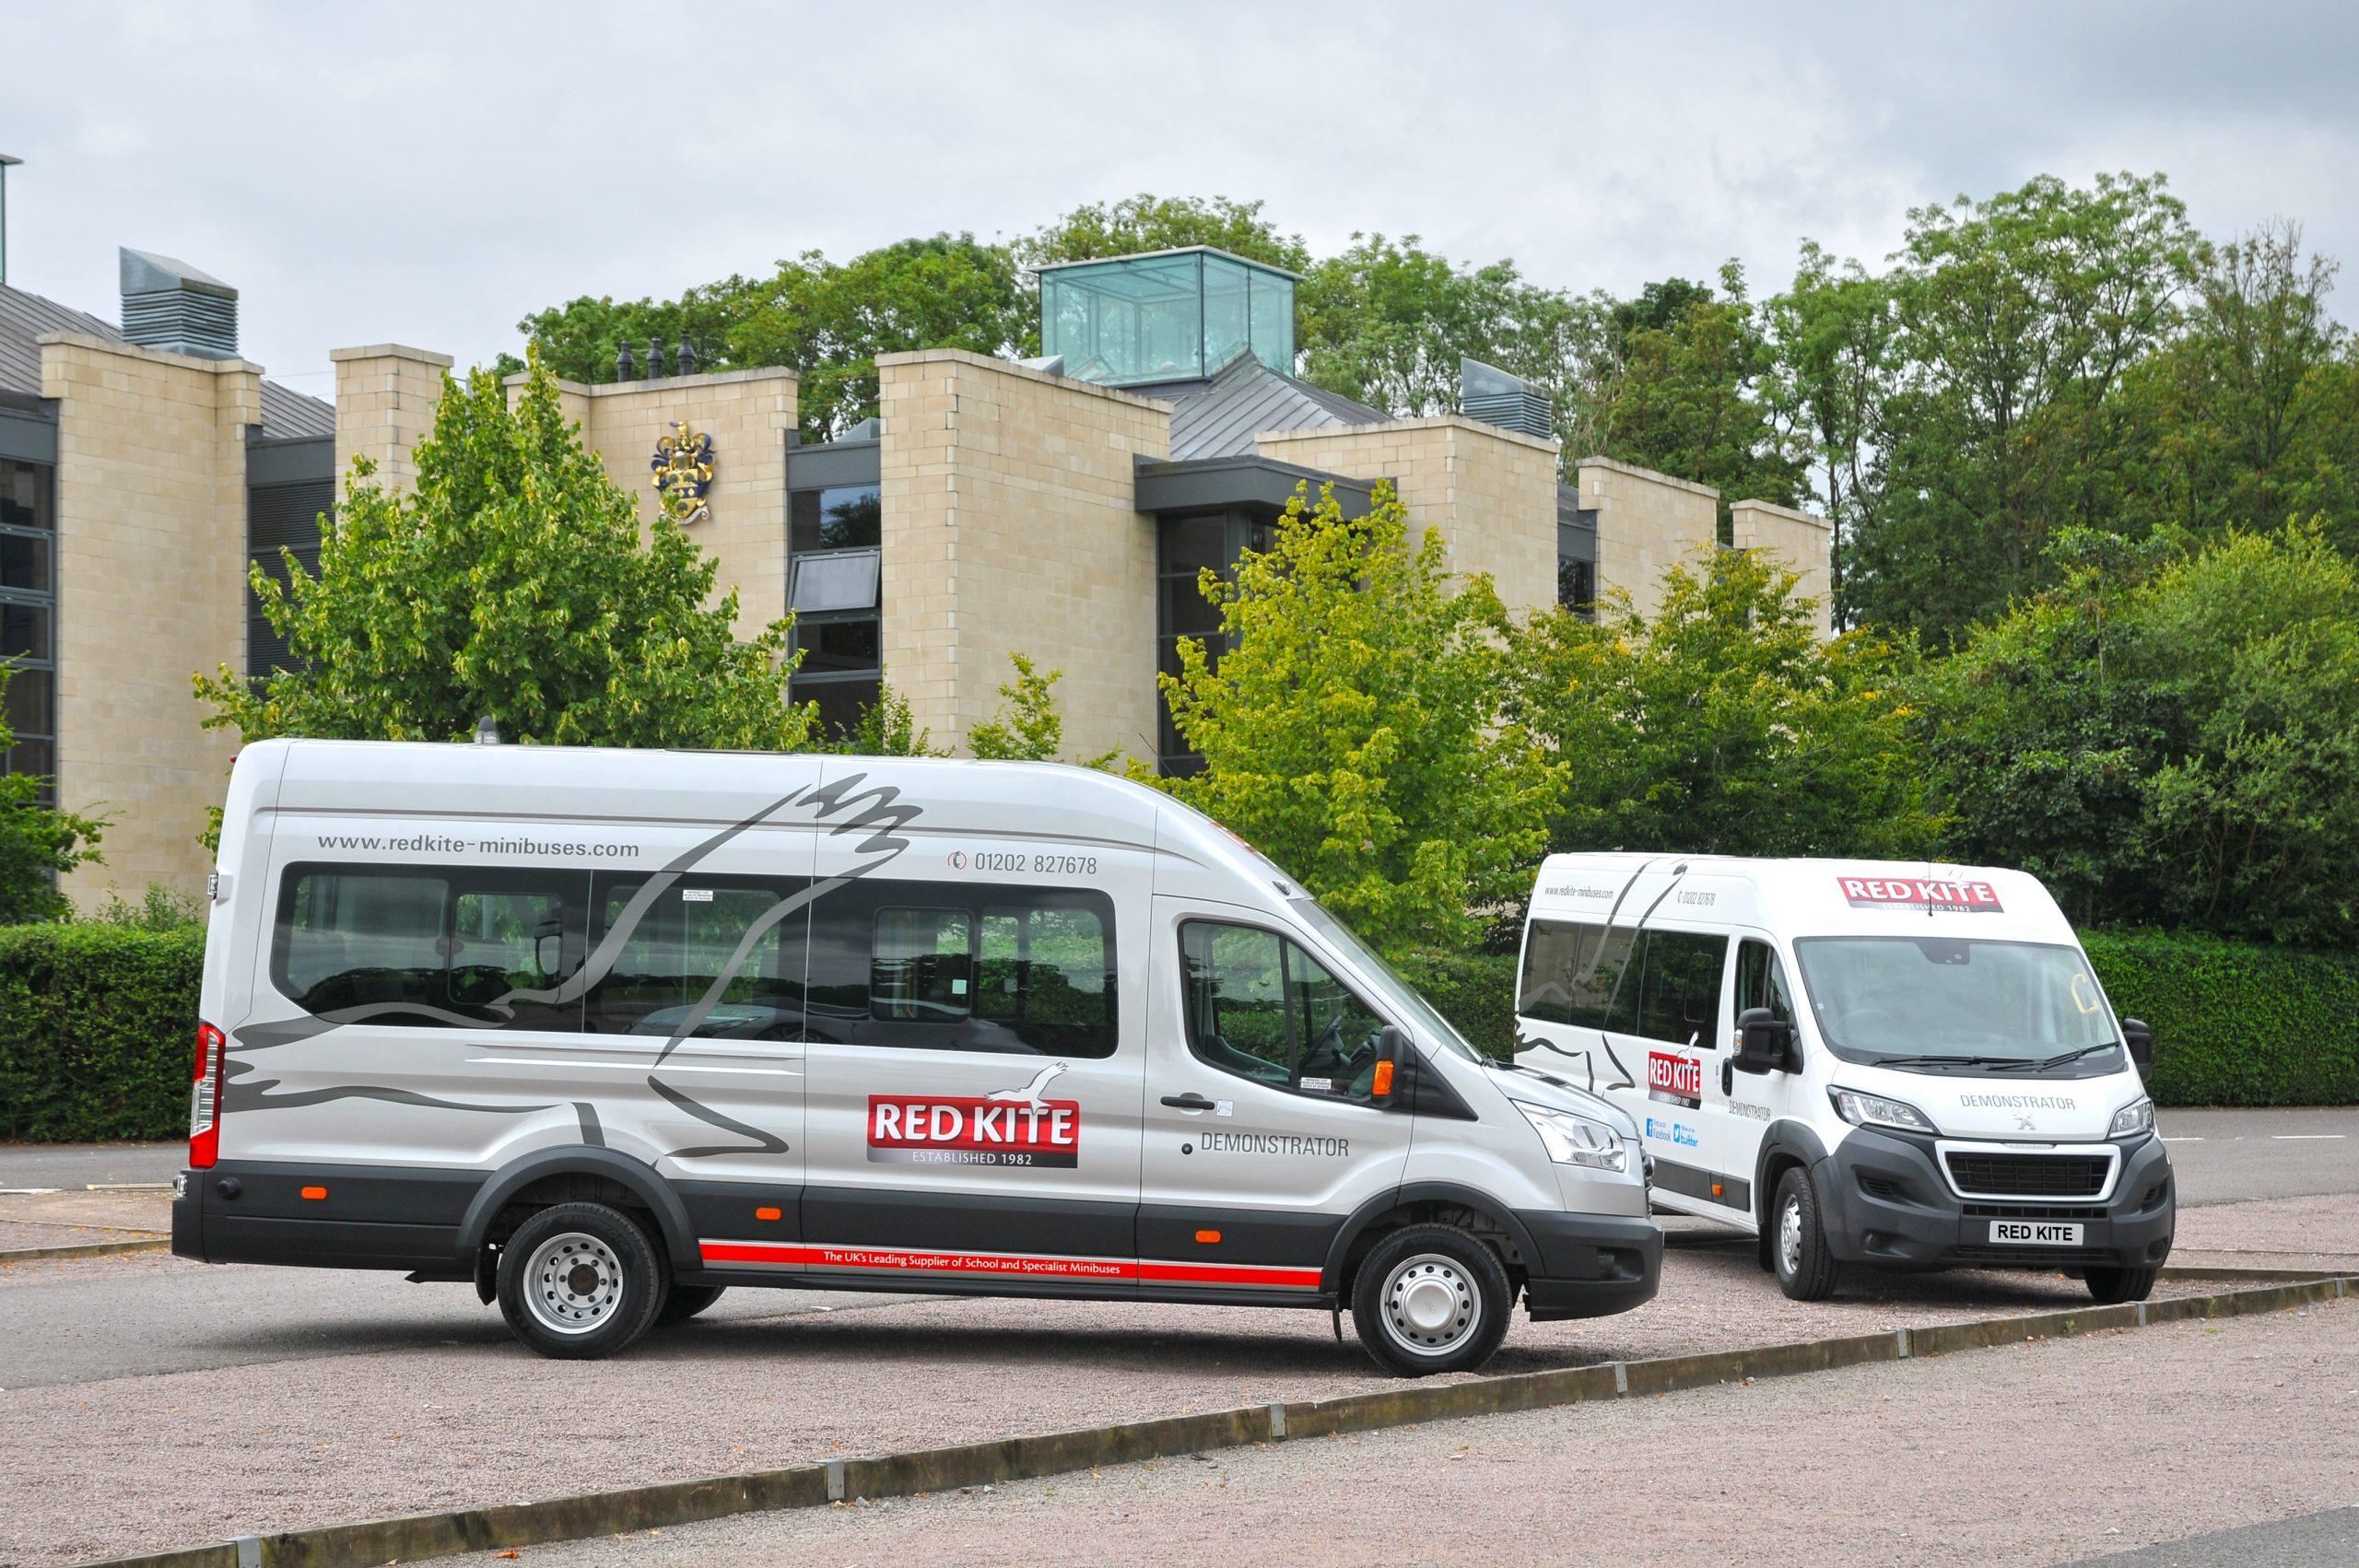 Red Kite College Minibuses